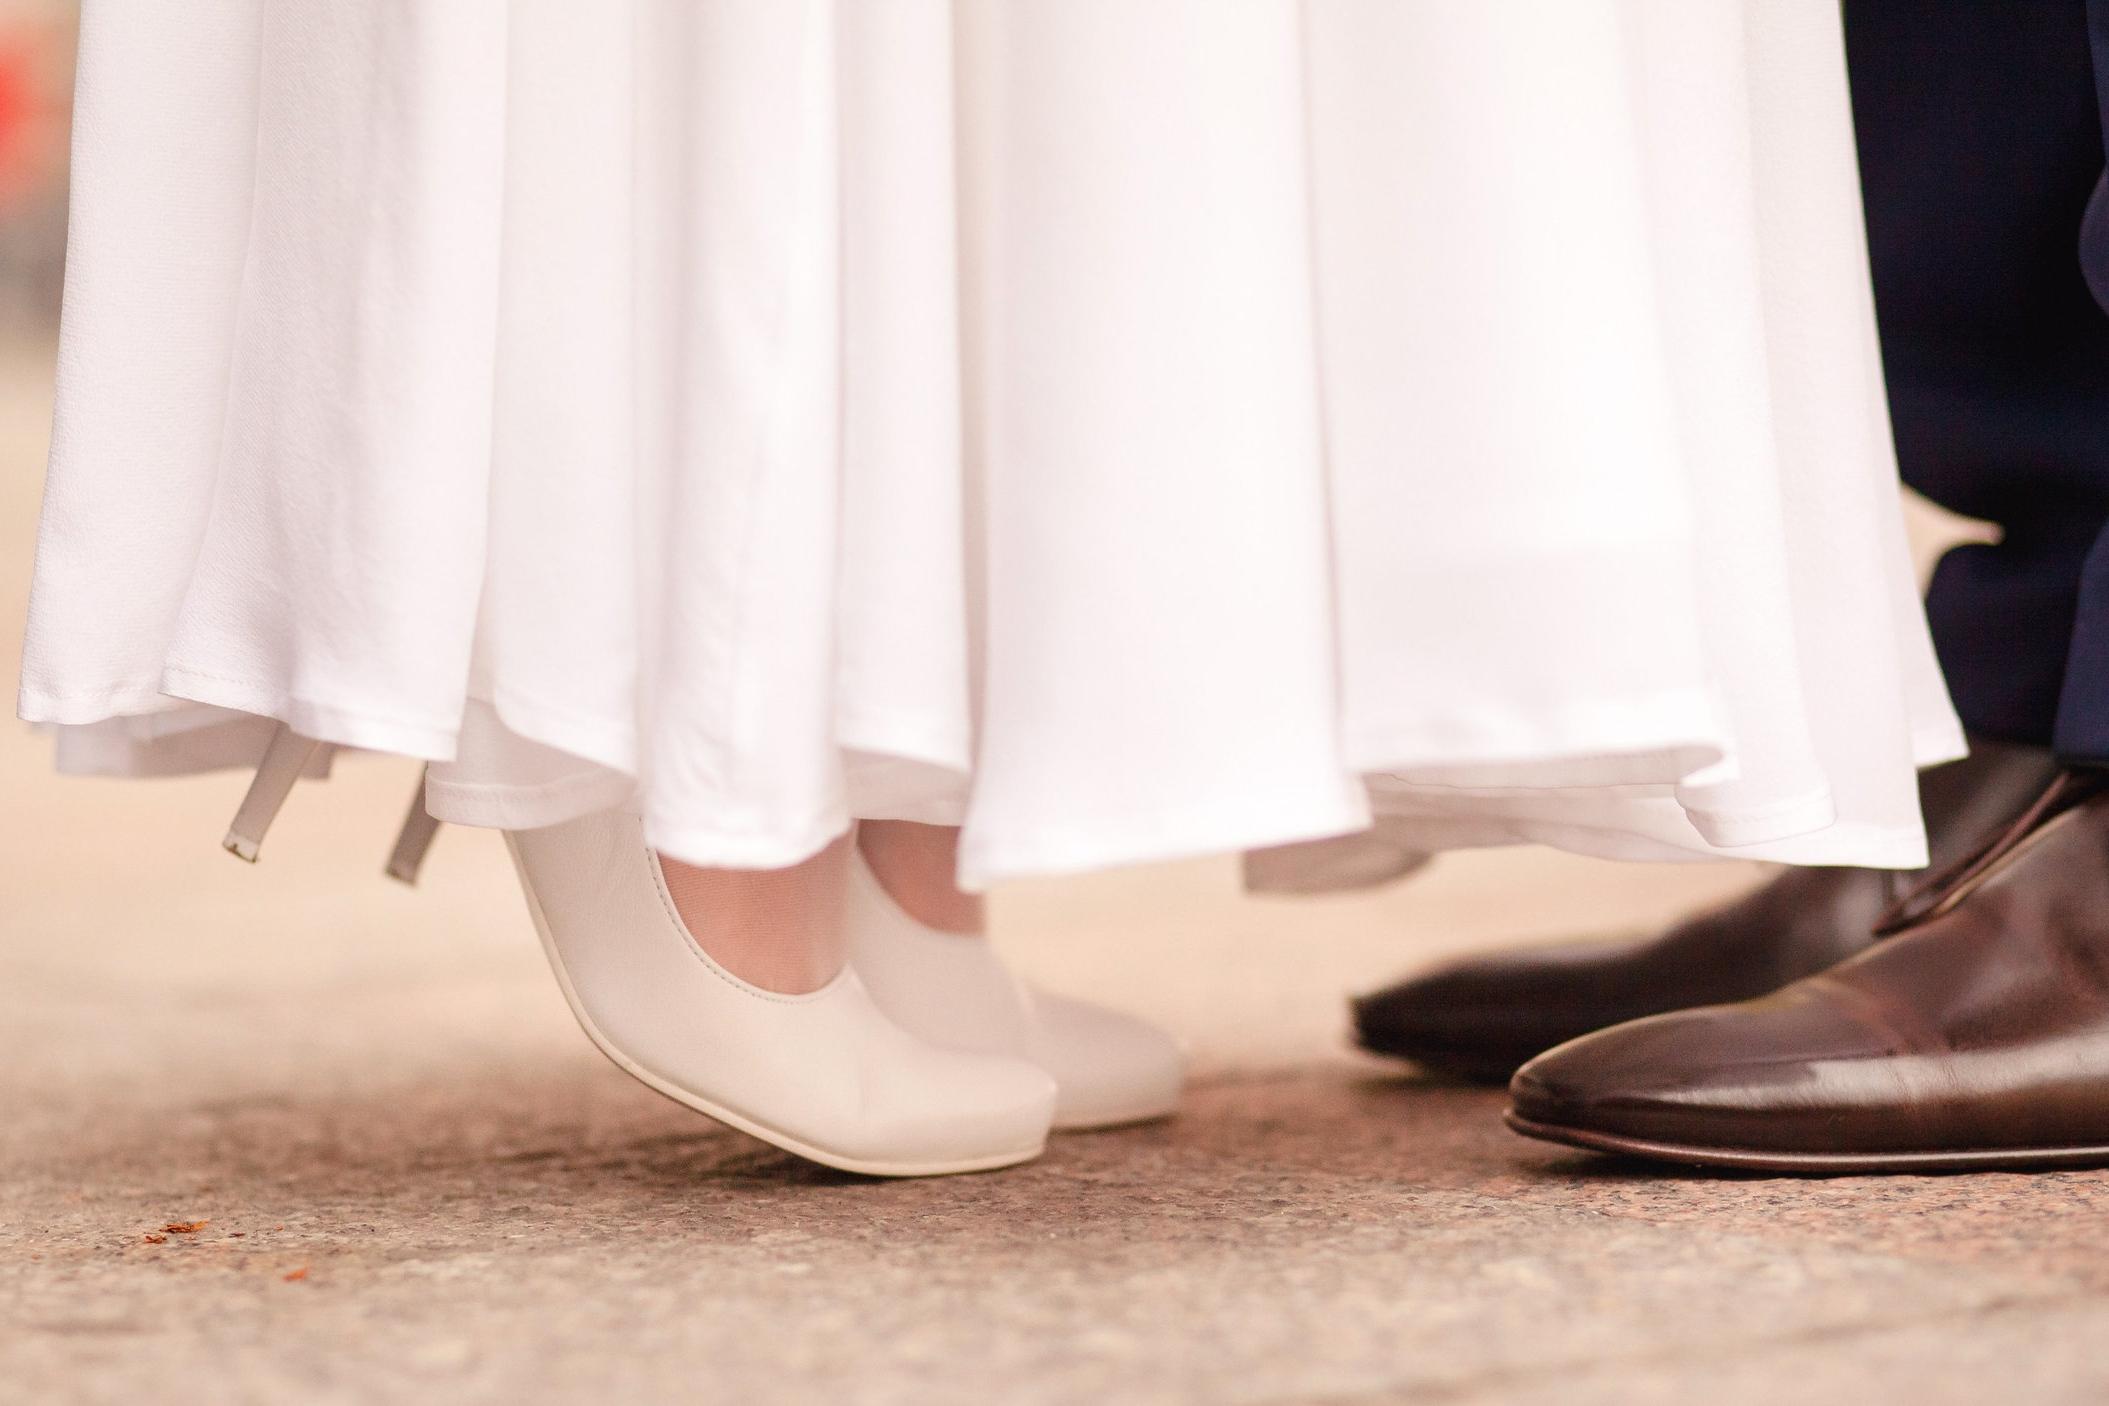 destination-wedding-photographer-bratislava-slovakia-europe-portrait-session-2.jpg